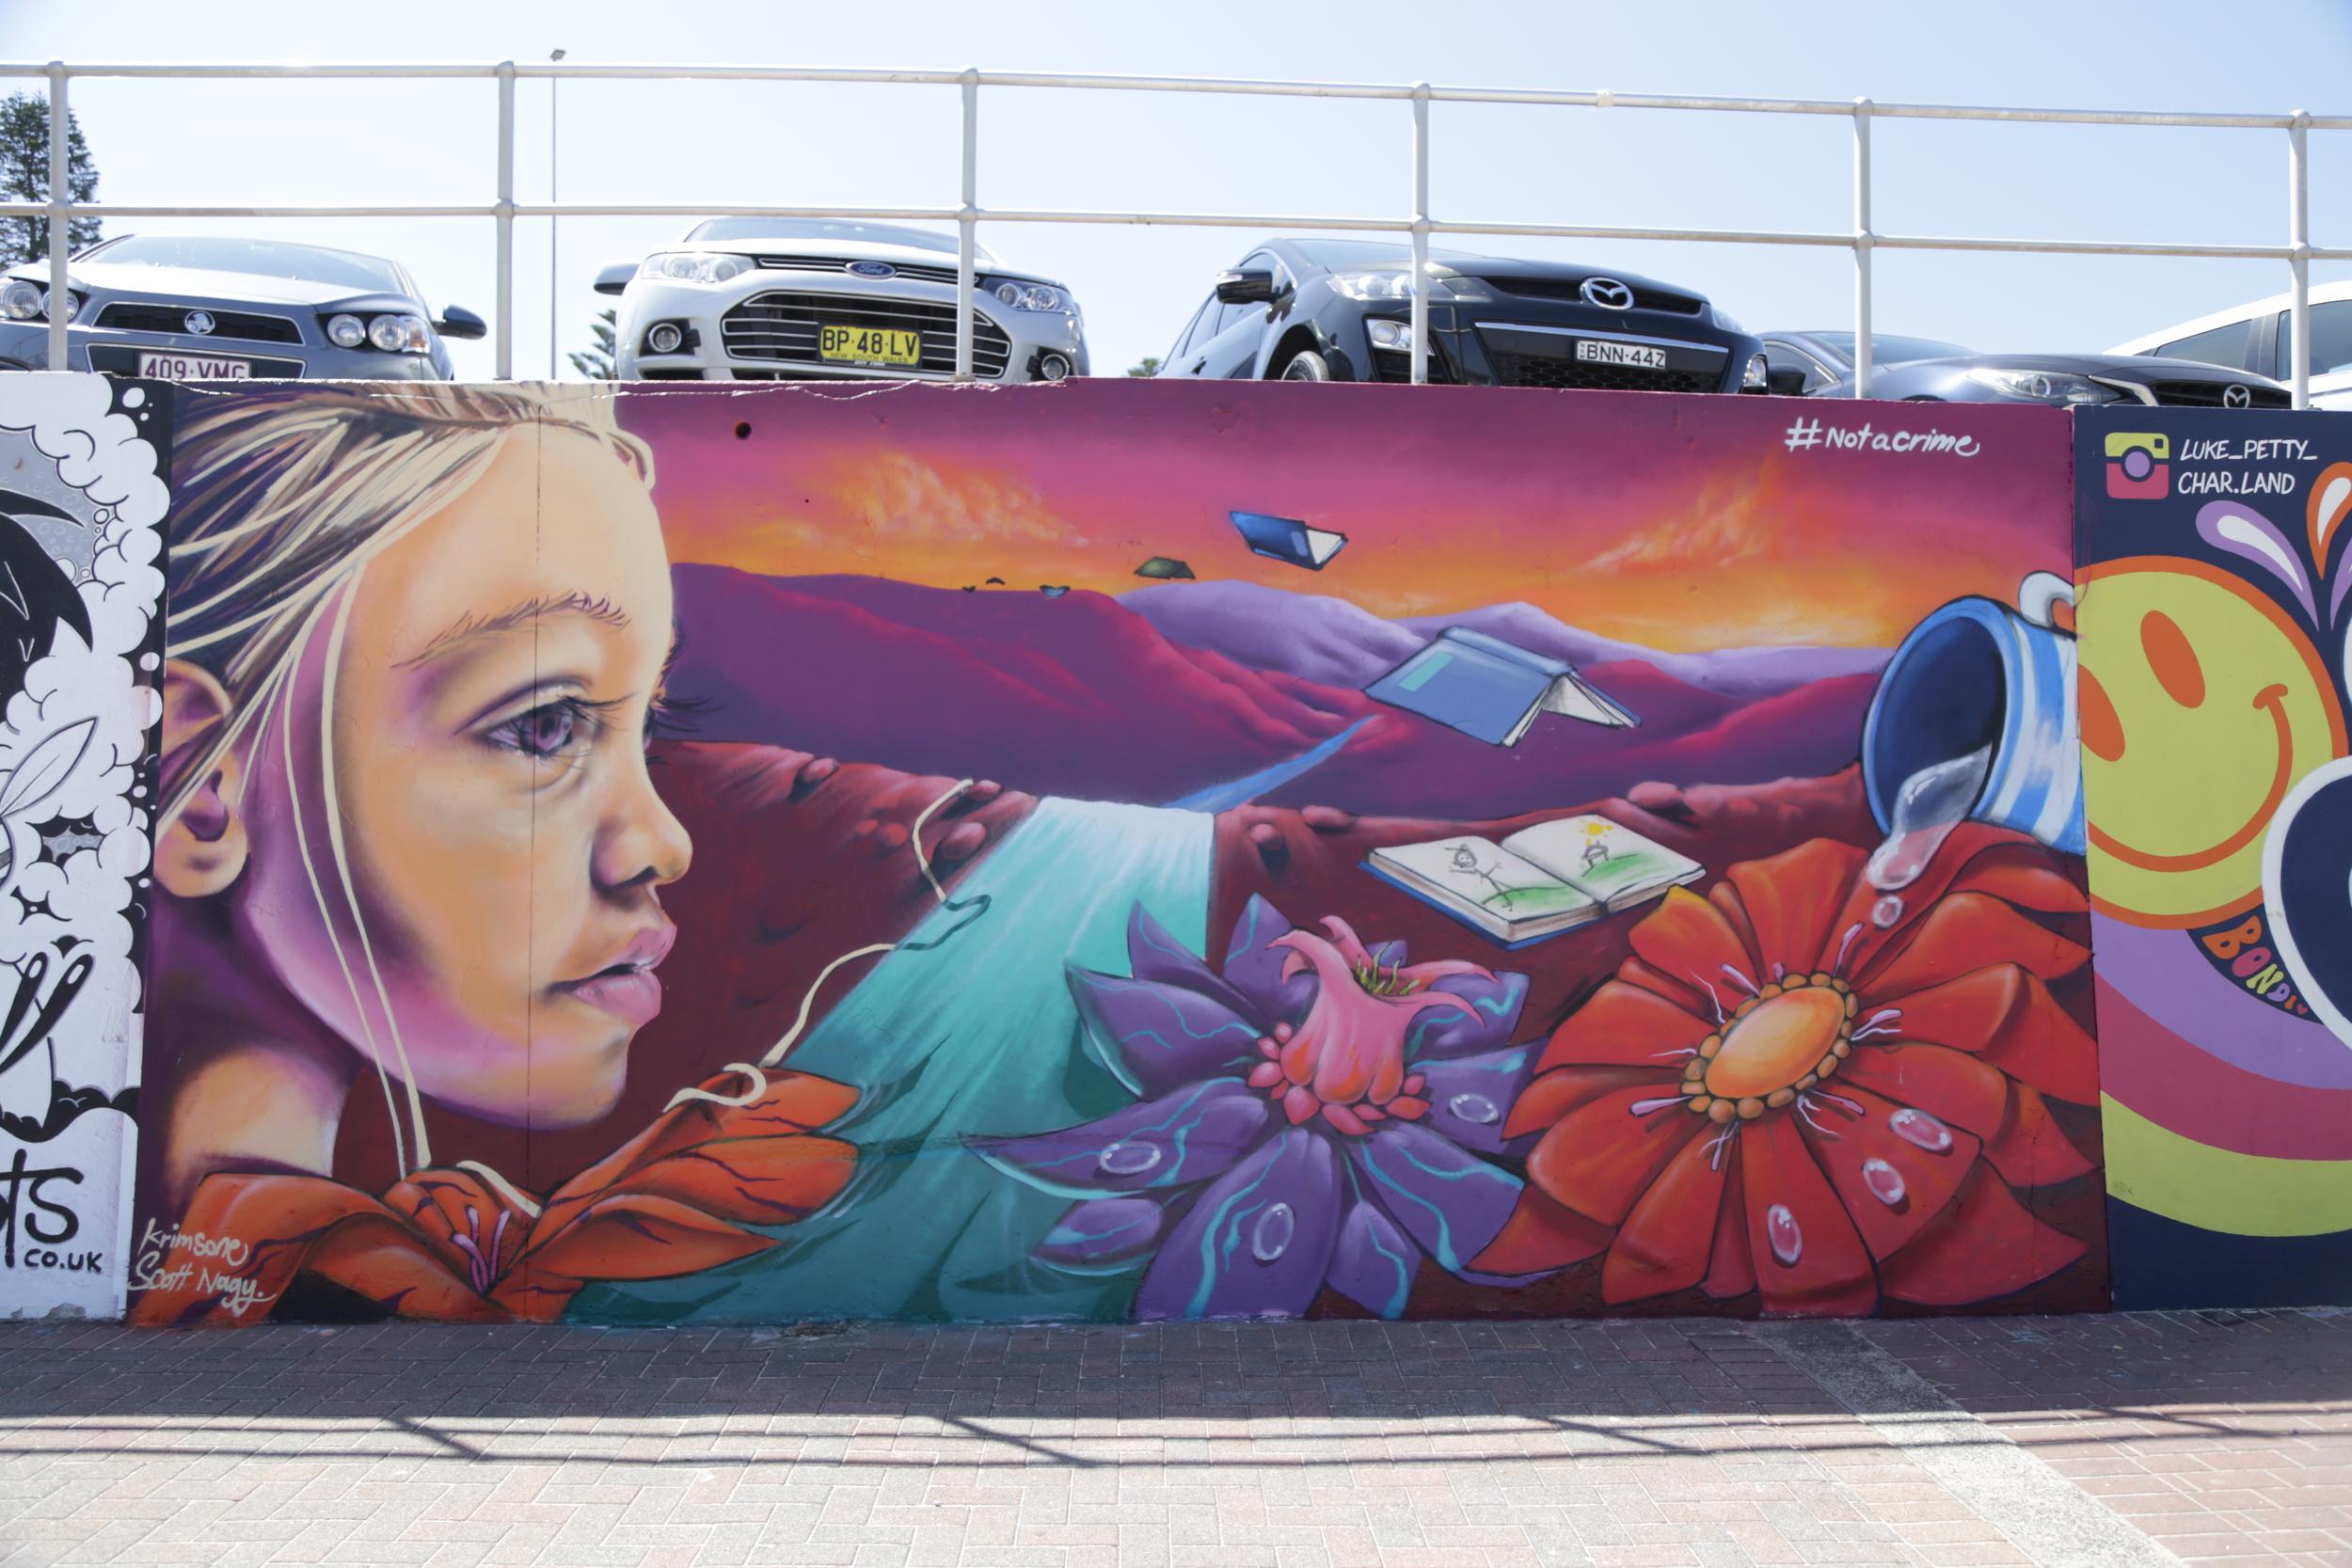 The Australian duo Krimsone & Scott Nagy's latest mural on Bondi Beach.